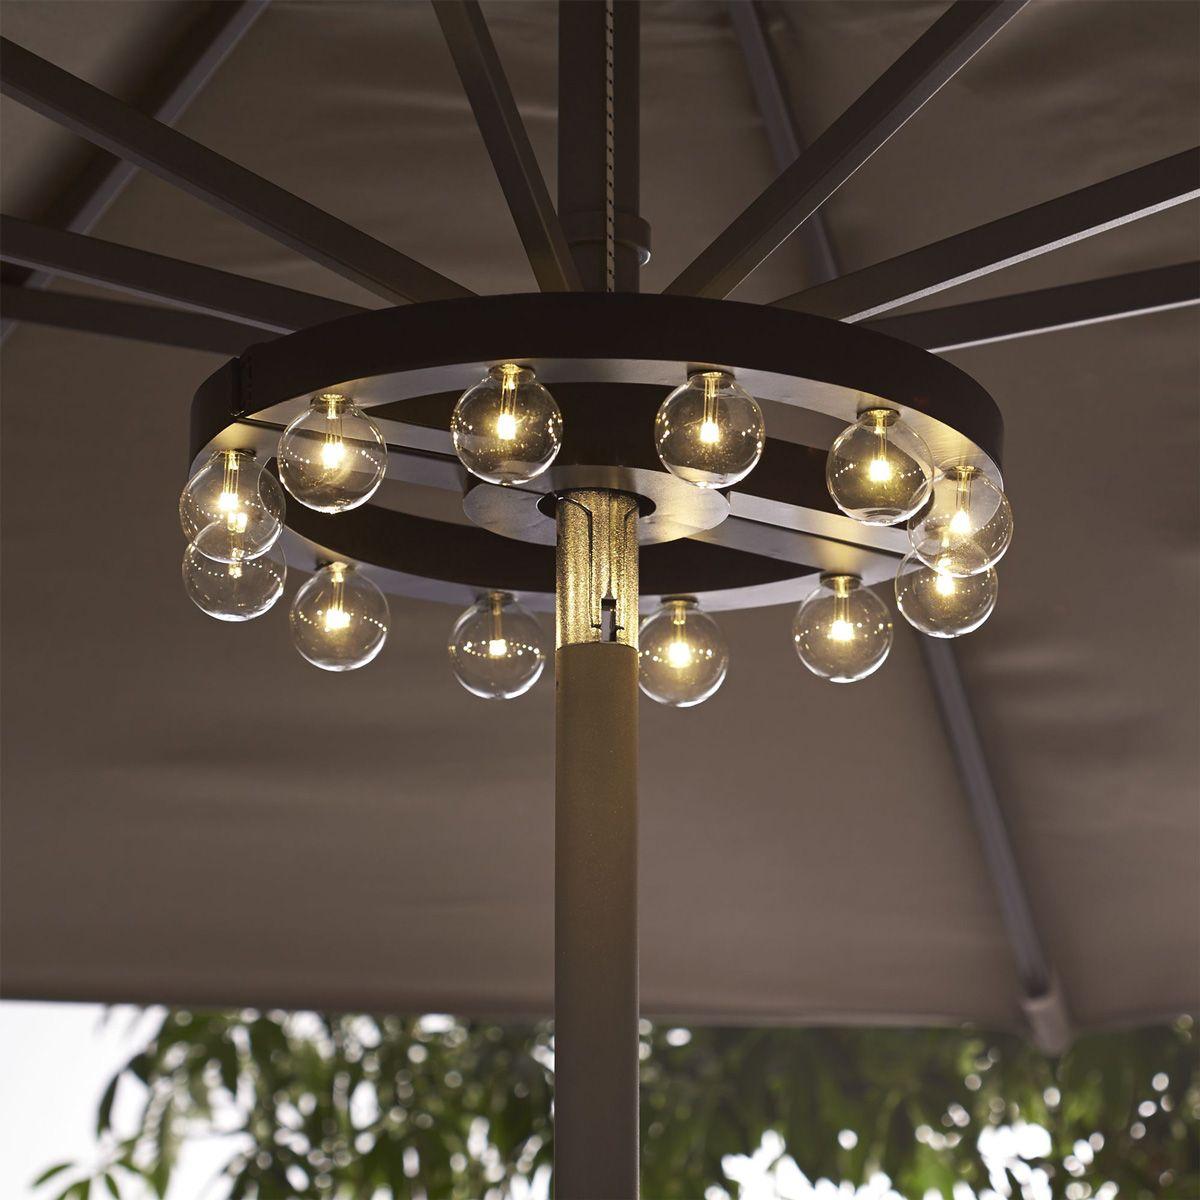 patio umbrella lights patio umbrella marquee lights -